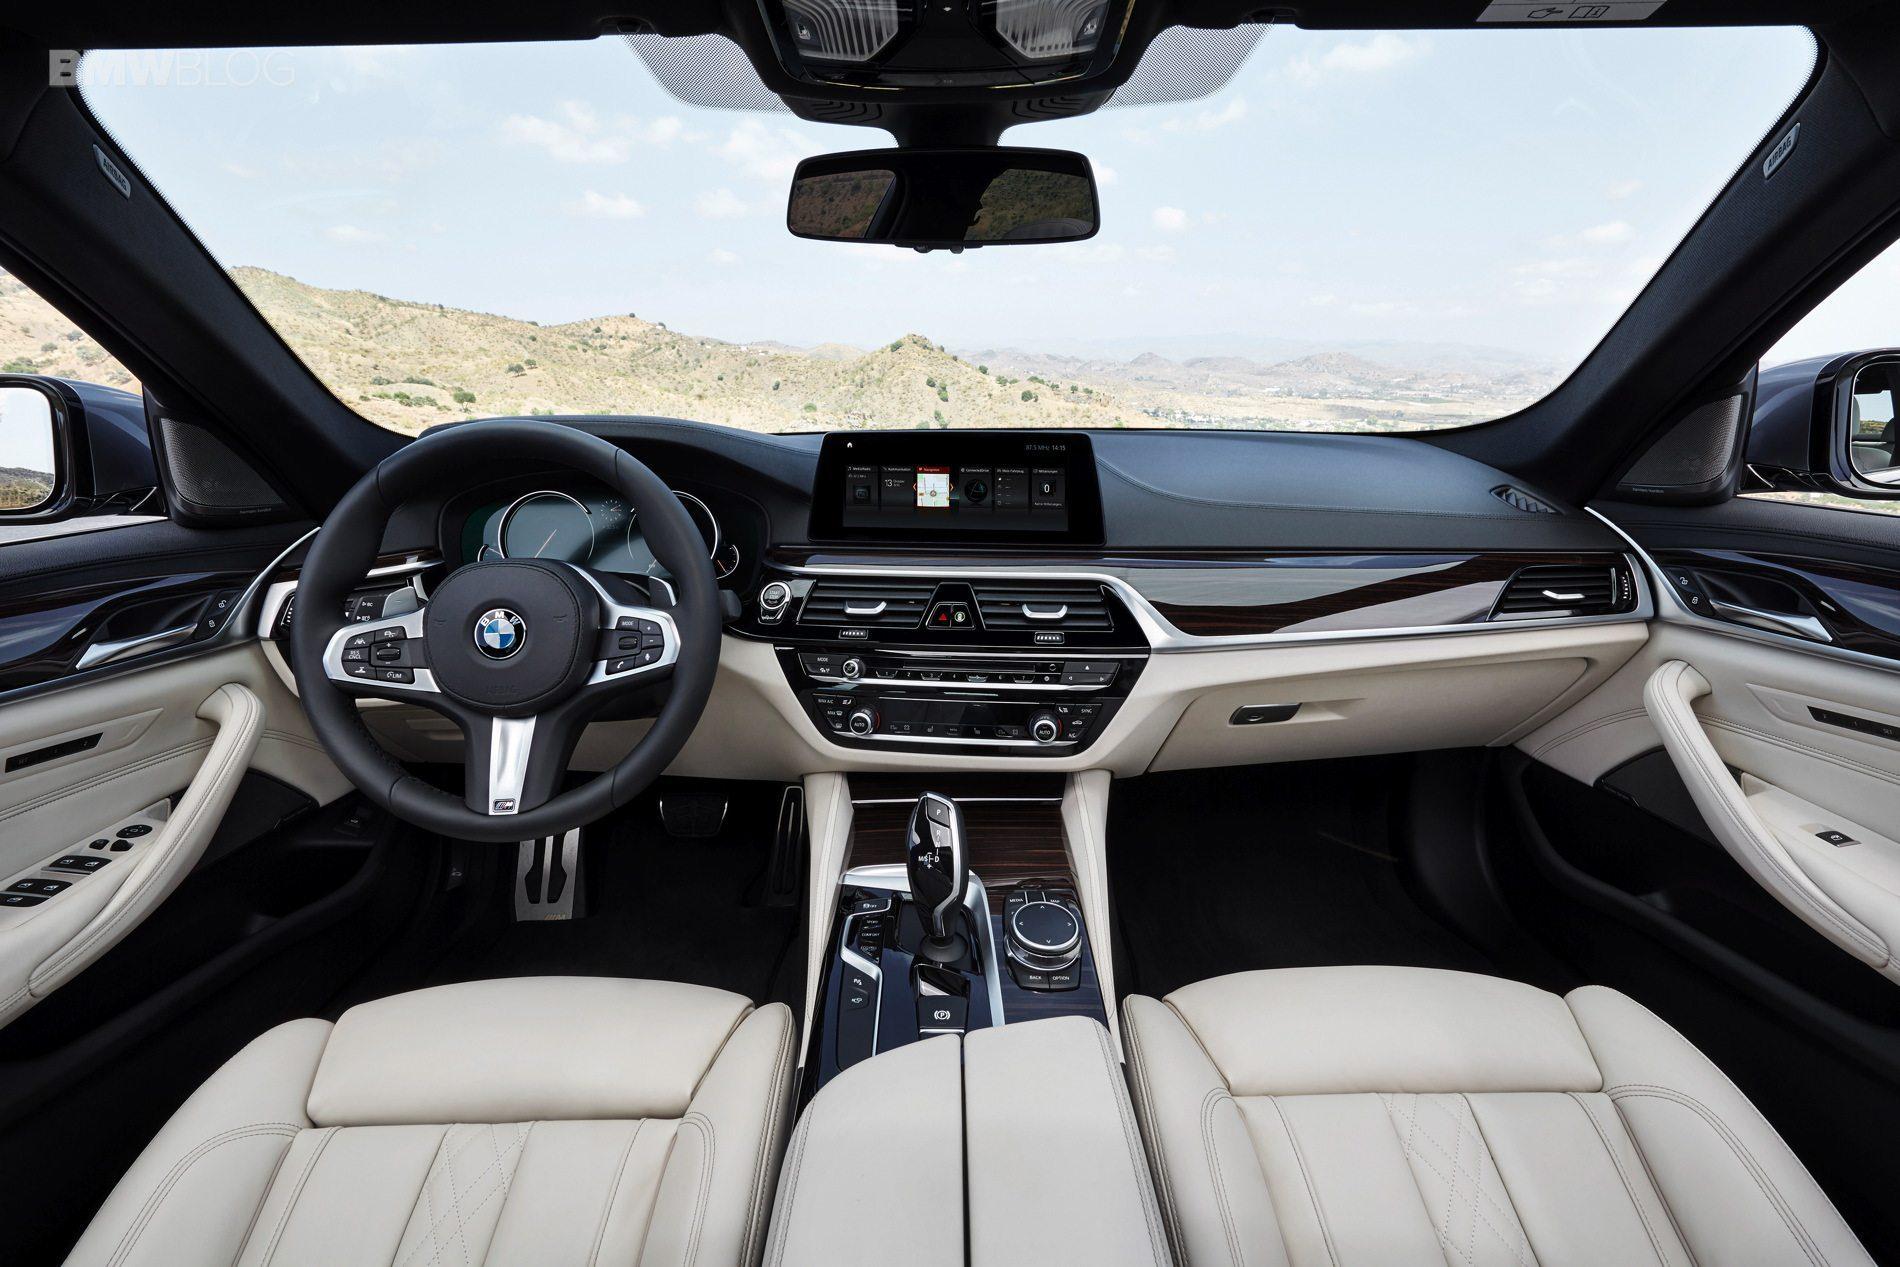 Bmw G30 5 Series M Sport Interior 26 My Car Portal